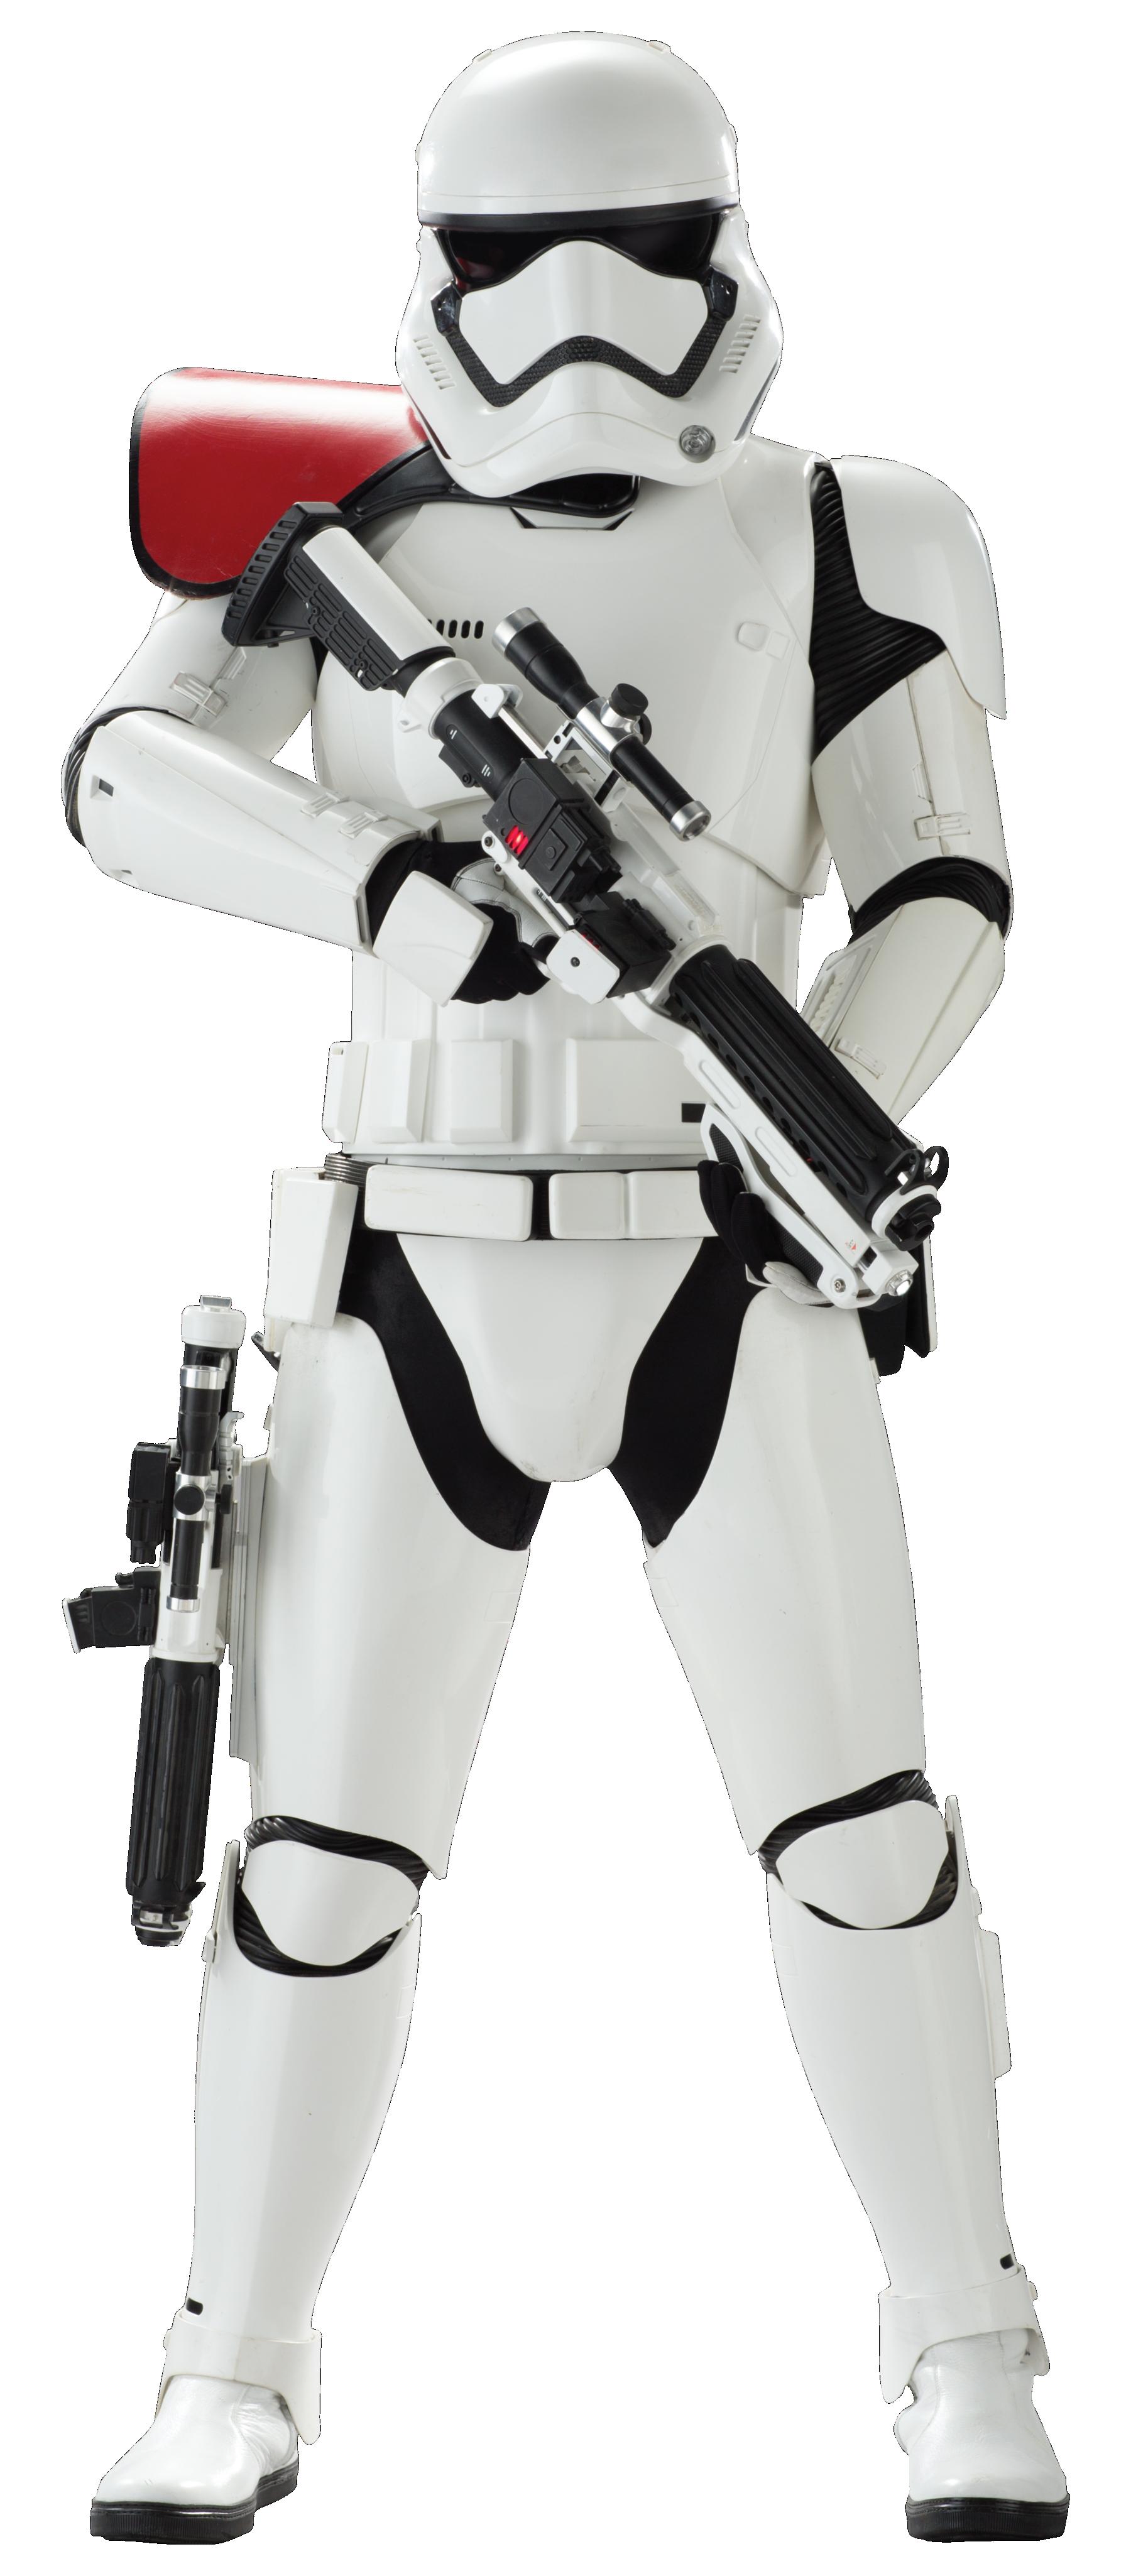 First Order Stormtrooper Armor Stormtrooper Star Wars Trooper Star Wars Stormtrooper